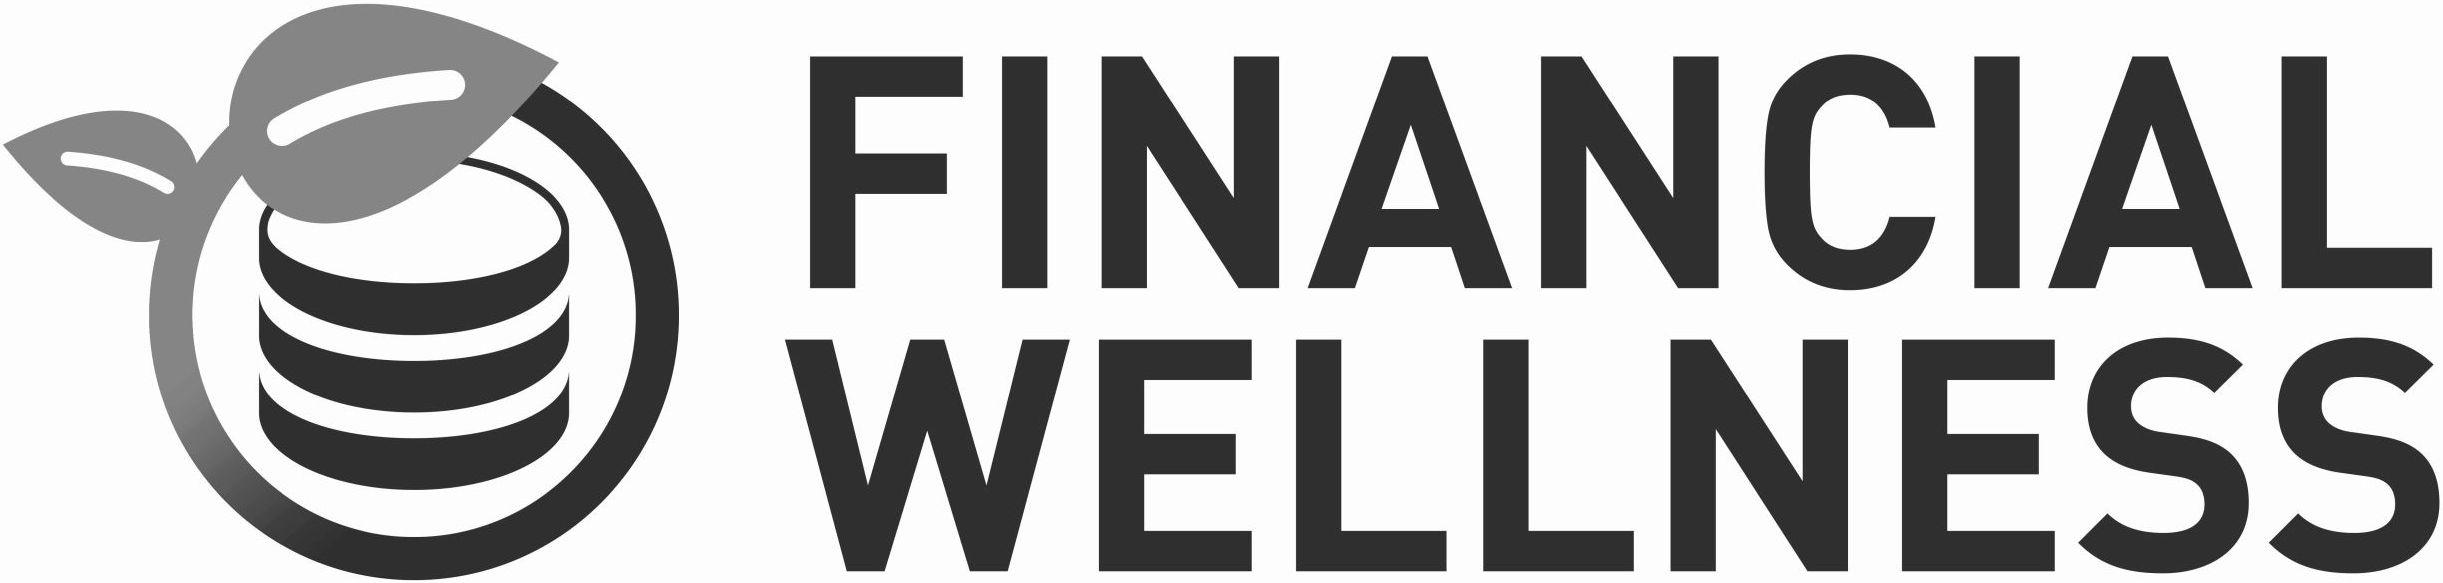 Wort-/Bildmarke: FINANCIAL WELLNESS